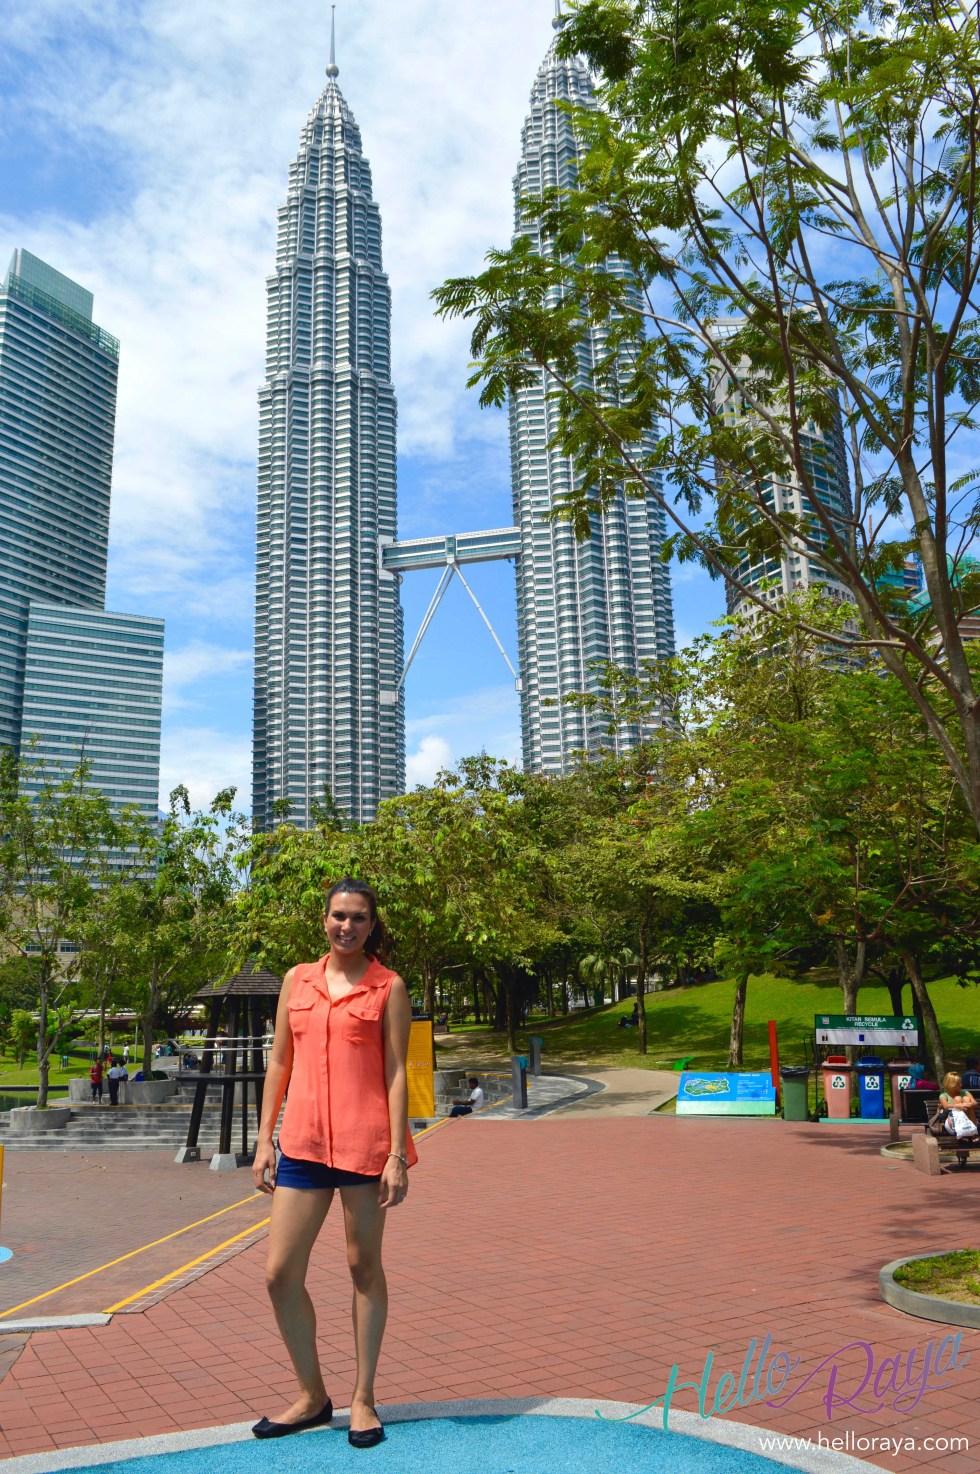 KL Twin Towers, KLCC | Free Things to do in Kuala Lumpur | Hello Raya Blog